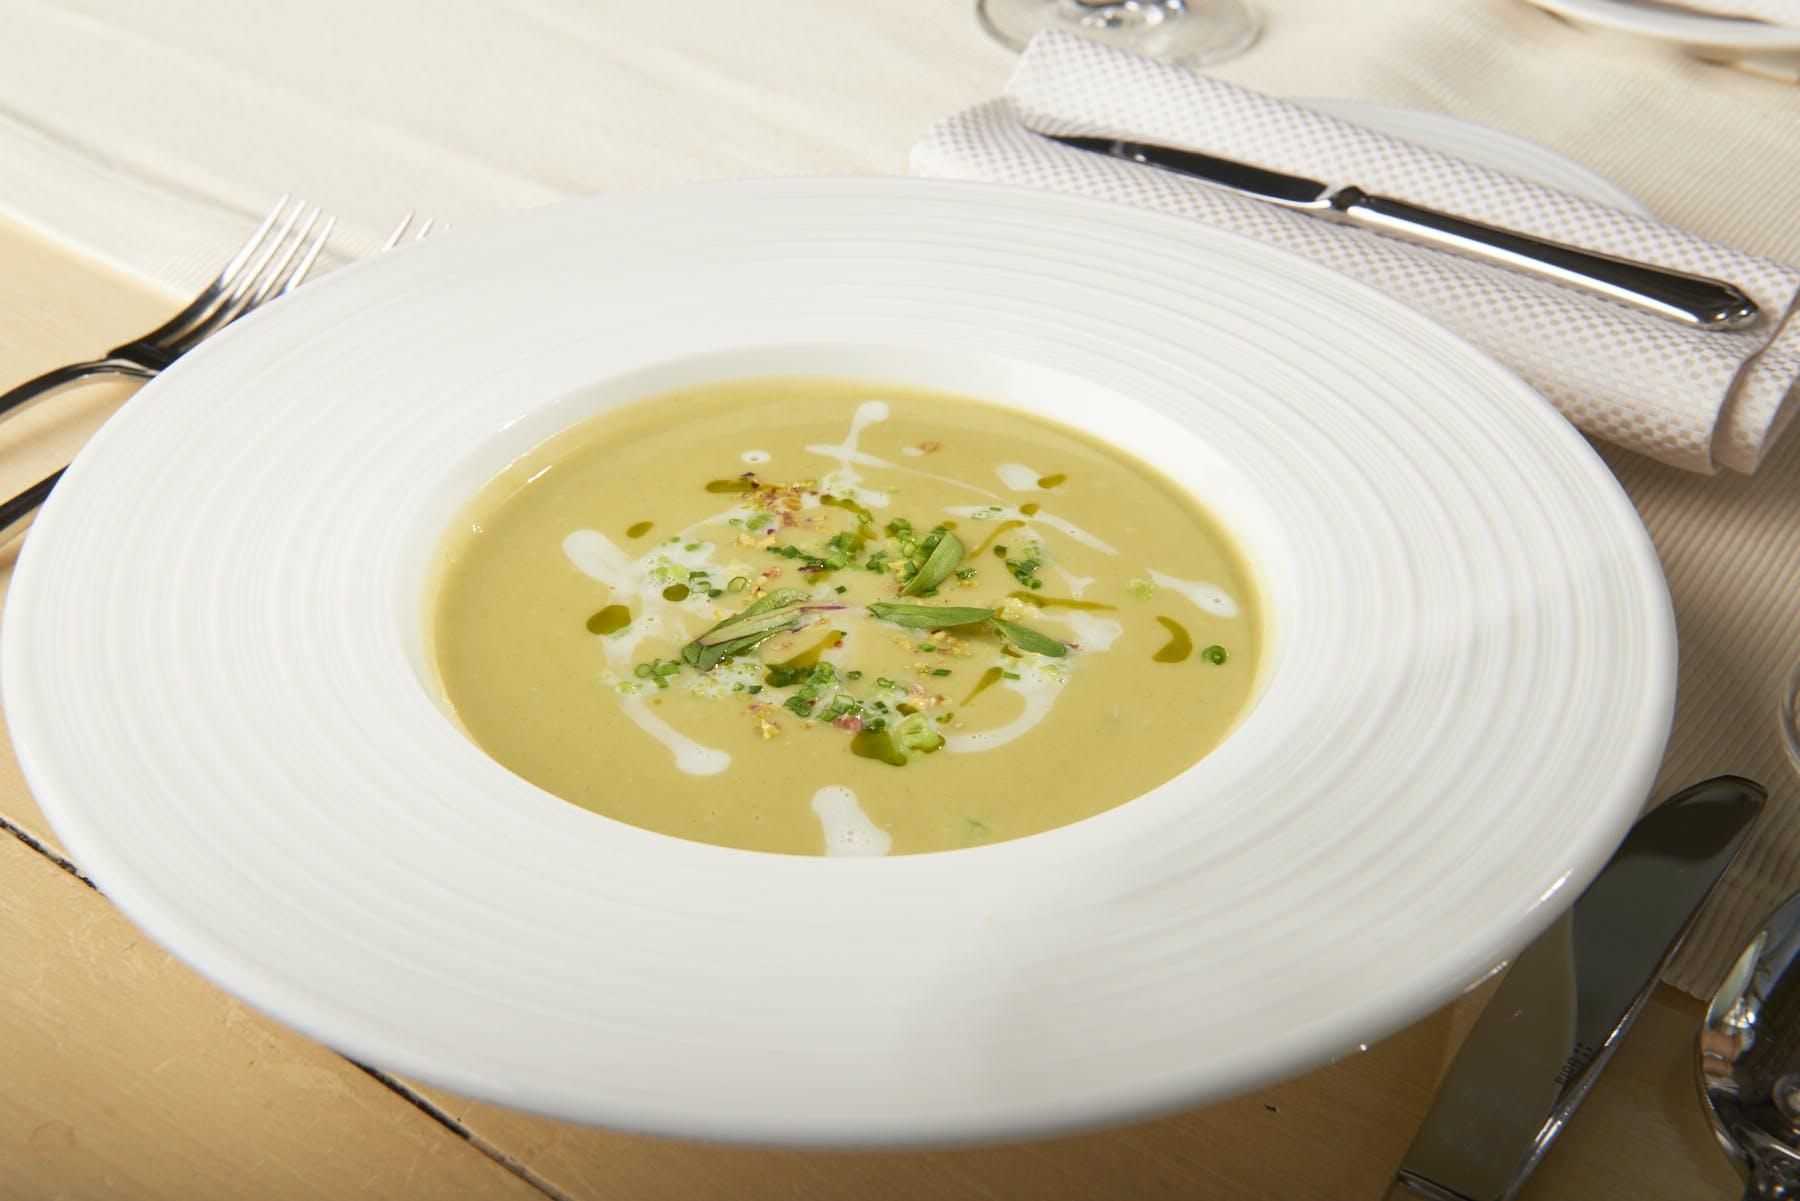 Free stock photo of food, food photo, food photography, romanesco soup